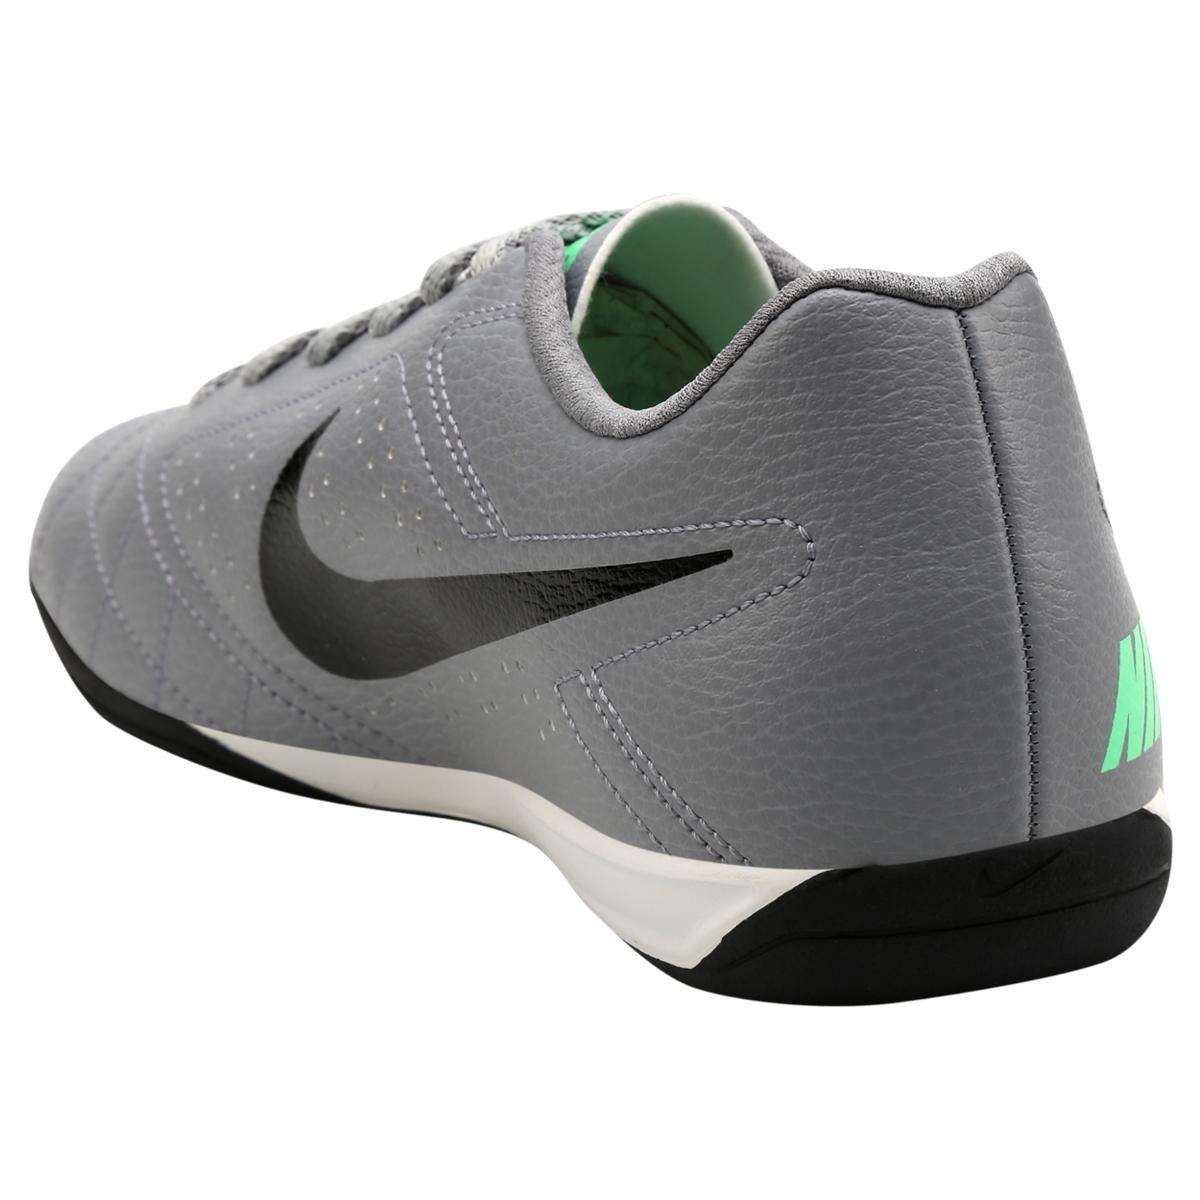 Chuteira Nike Futsal Beco Cinza Compre Agora Dafiti 16e2c8d01bf80